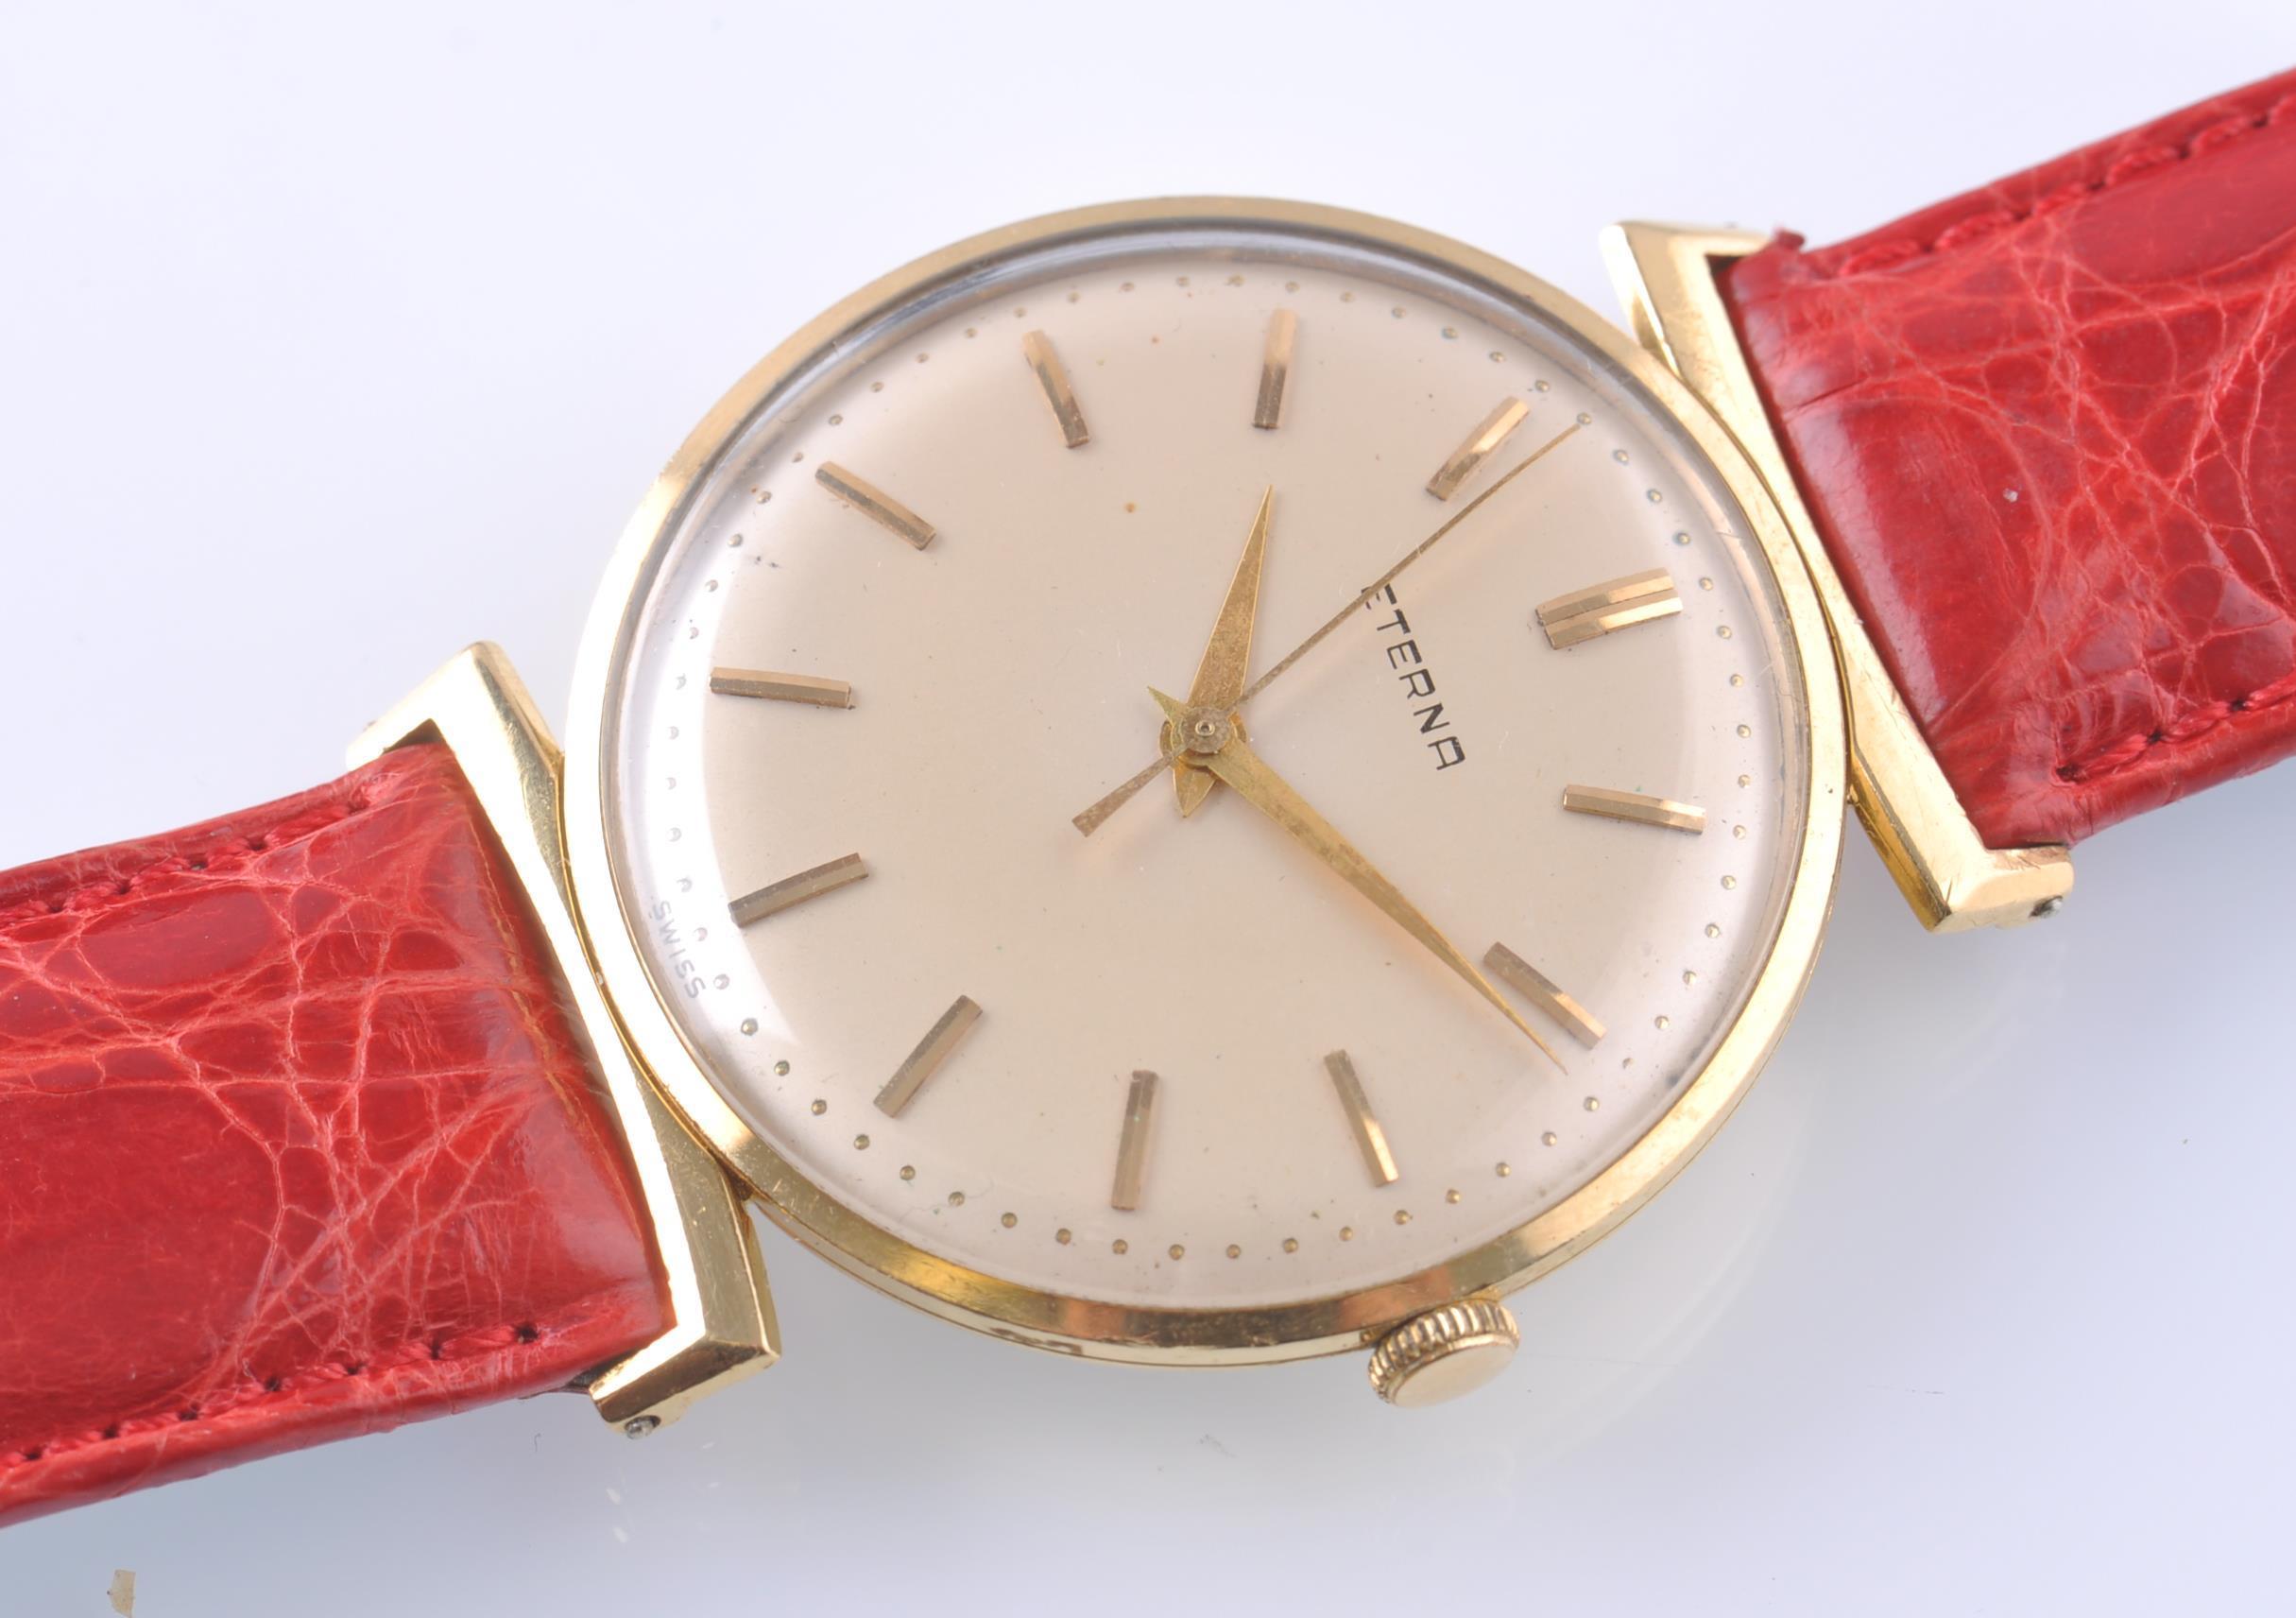 Lot 139 - ETERNA 18CT GOLD 1950'S VINTAGE WRIST WATCH